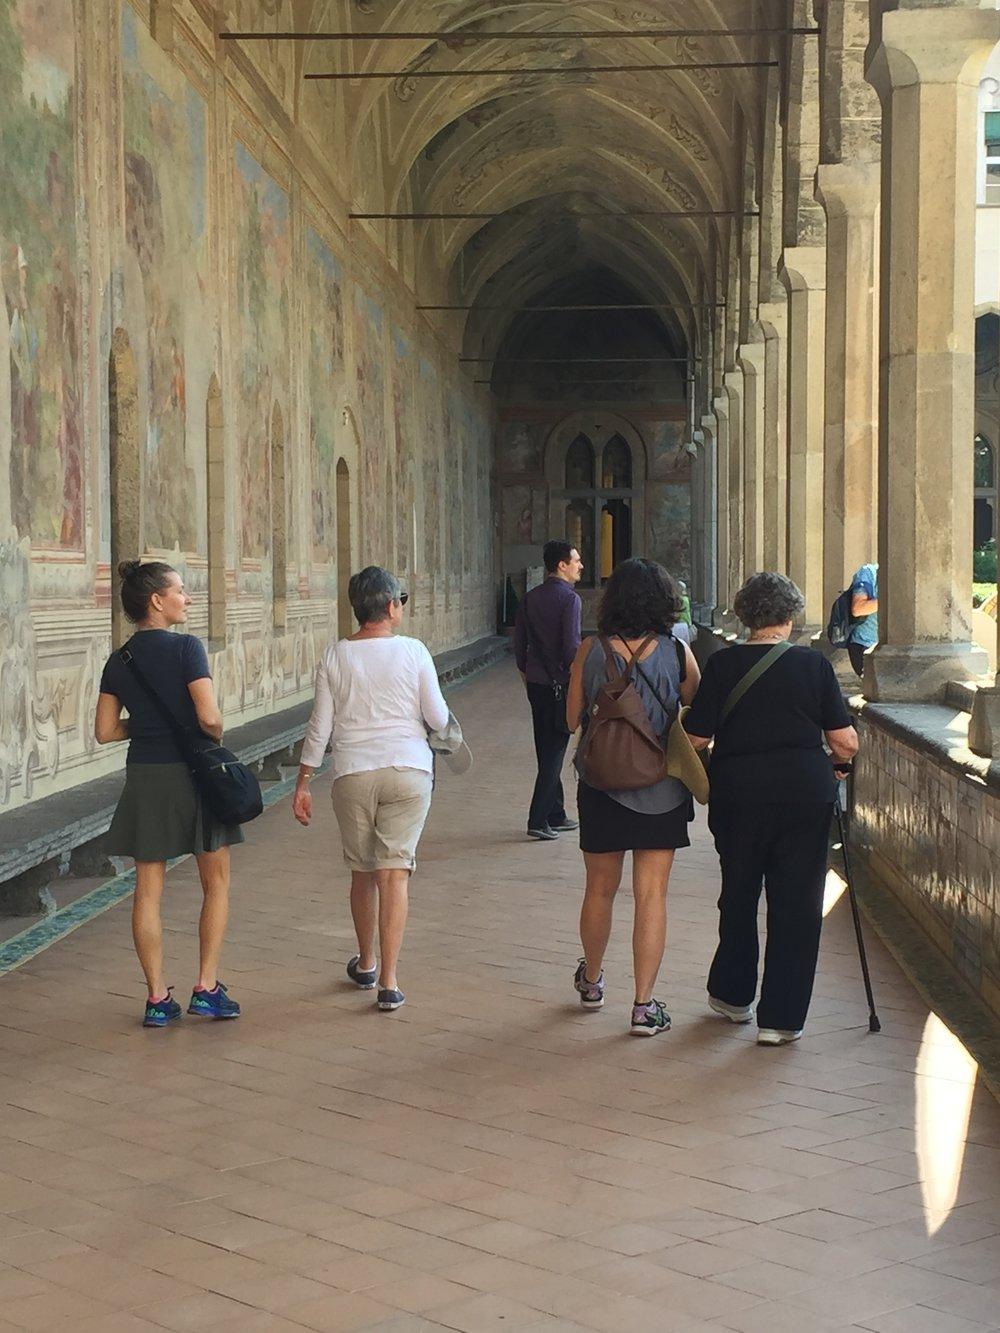 Inside the majolica cloister of Santa Chiara